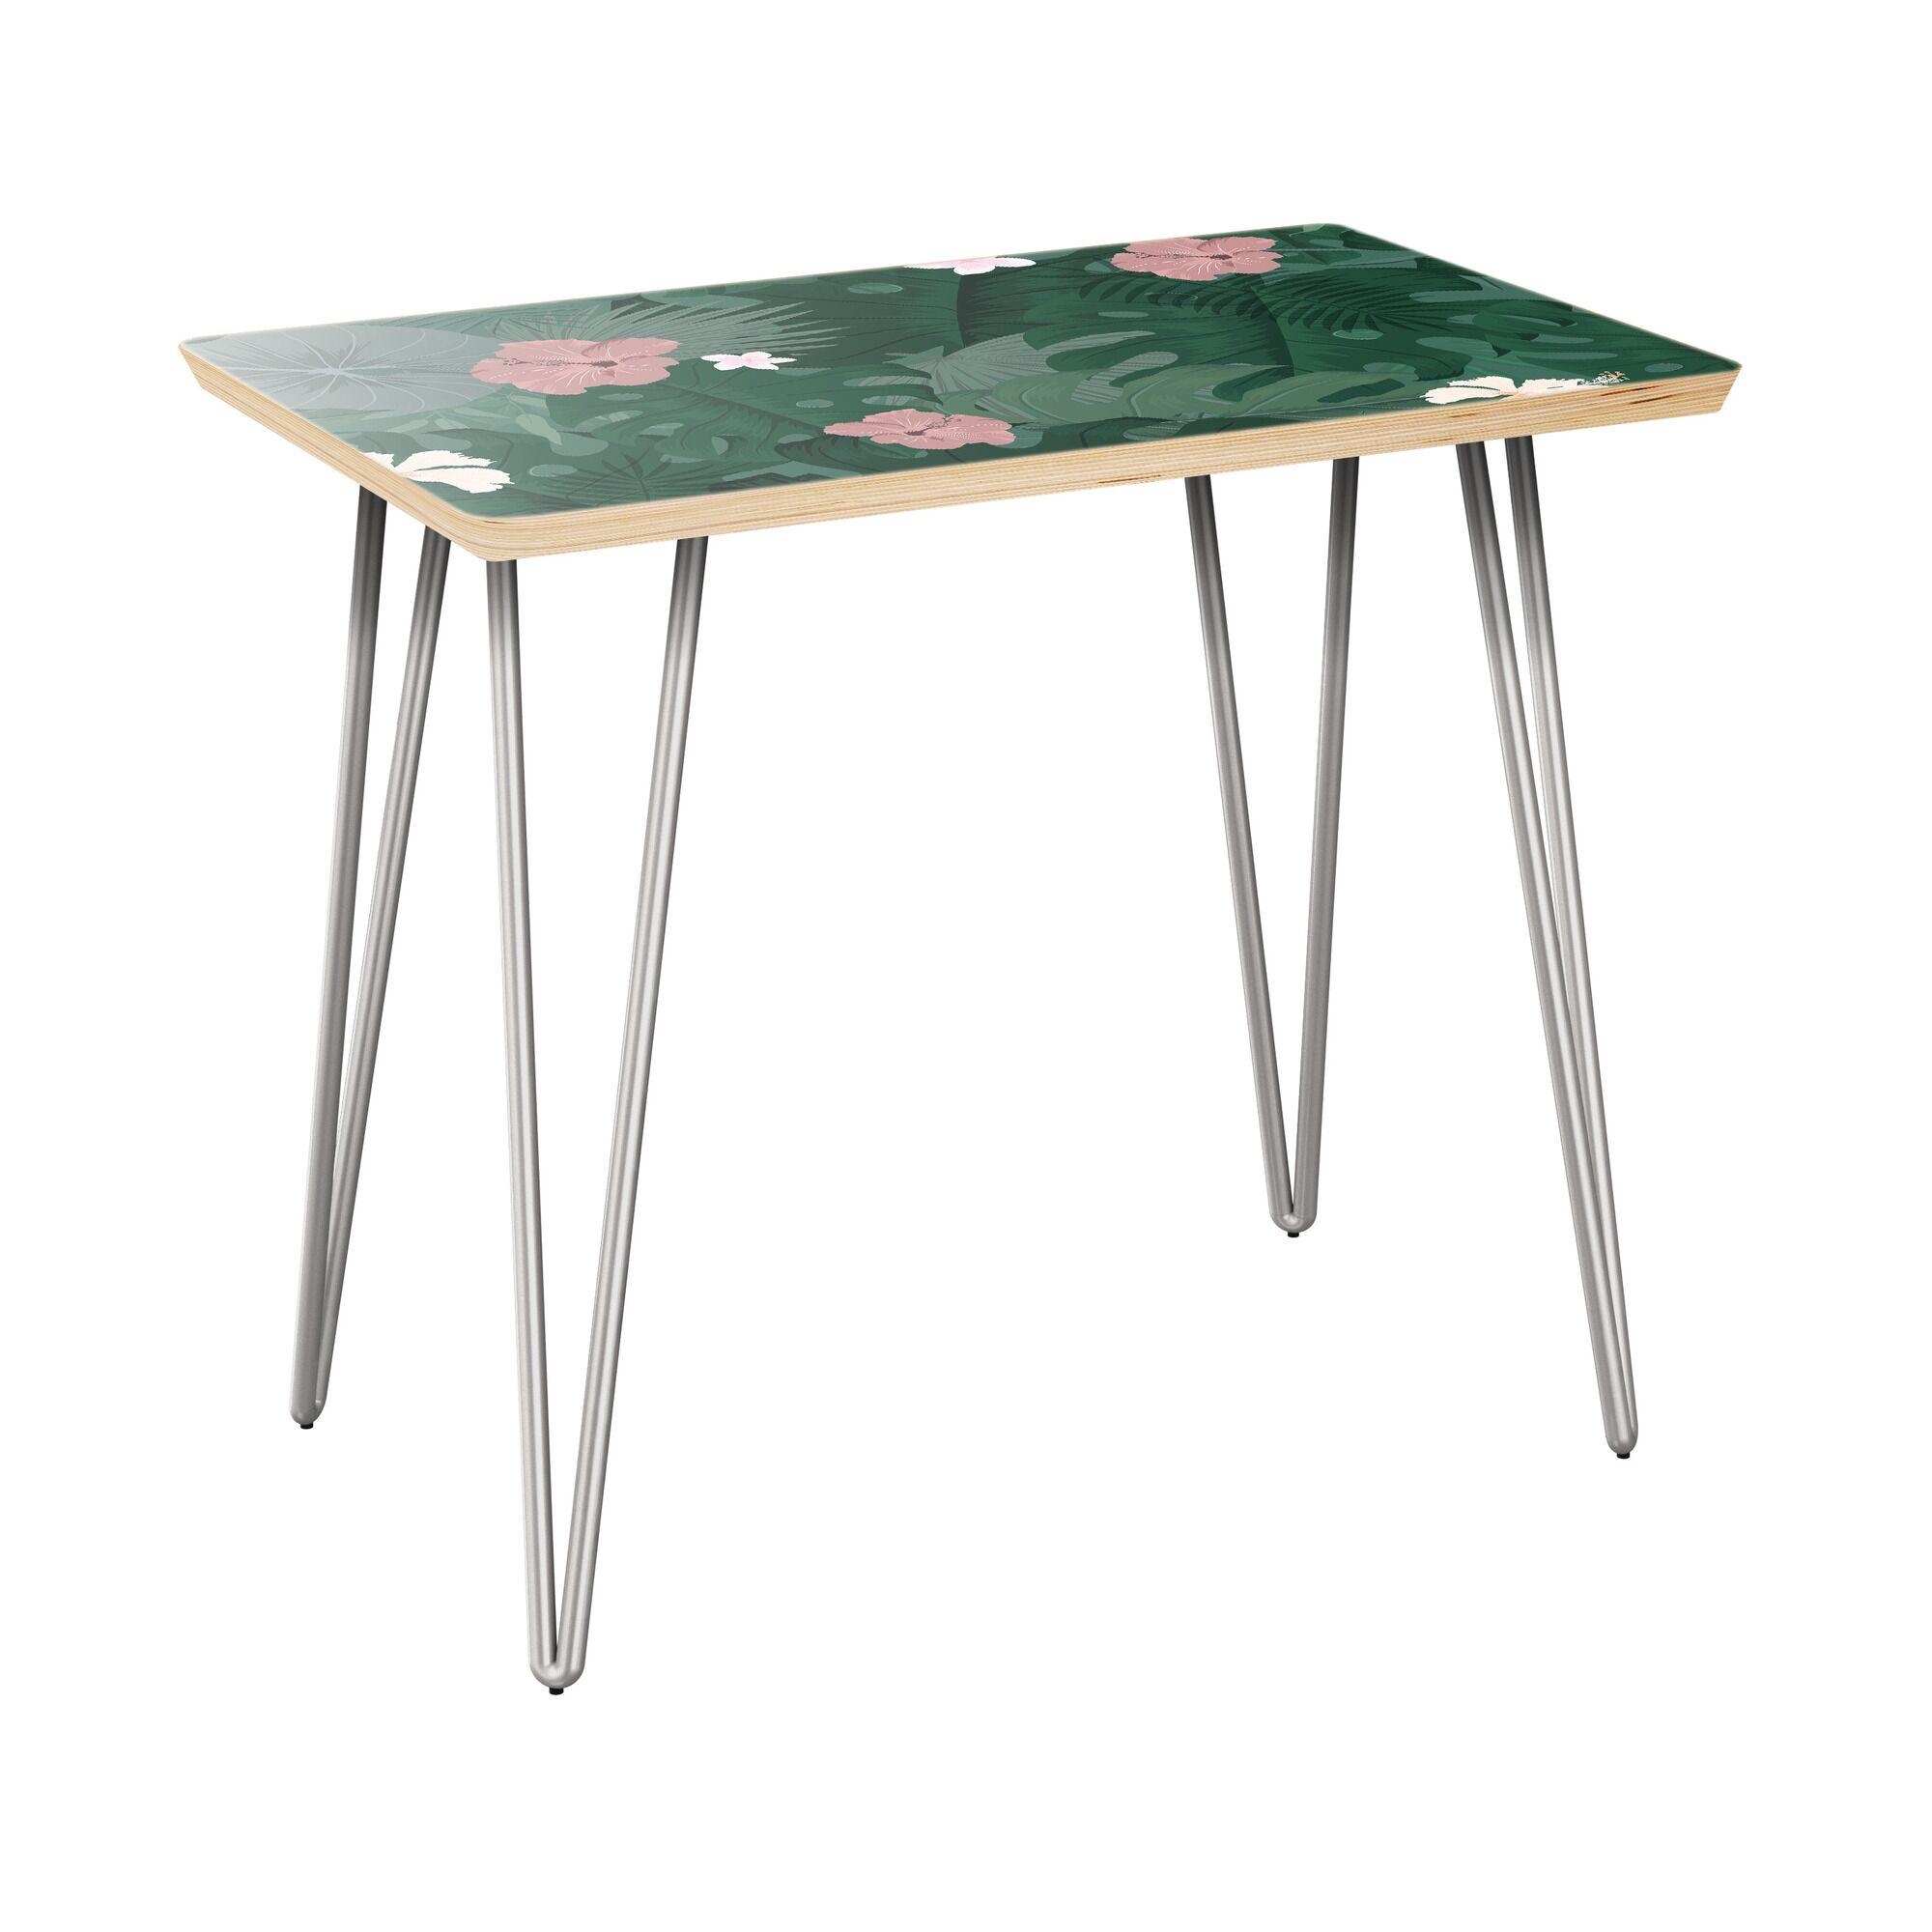 Rau End Table Table Base Color: Chrome, Table Top Color: Natural